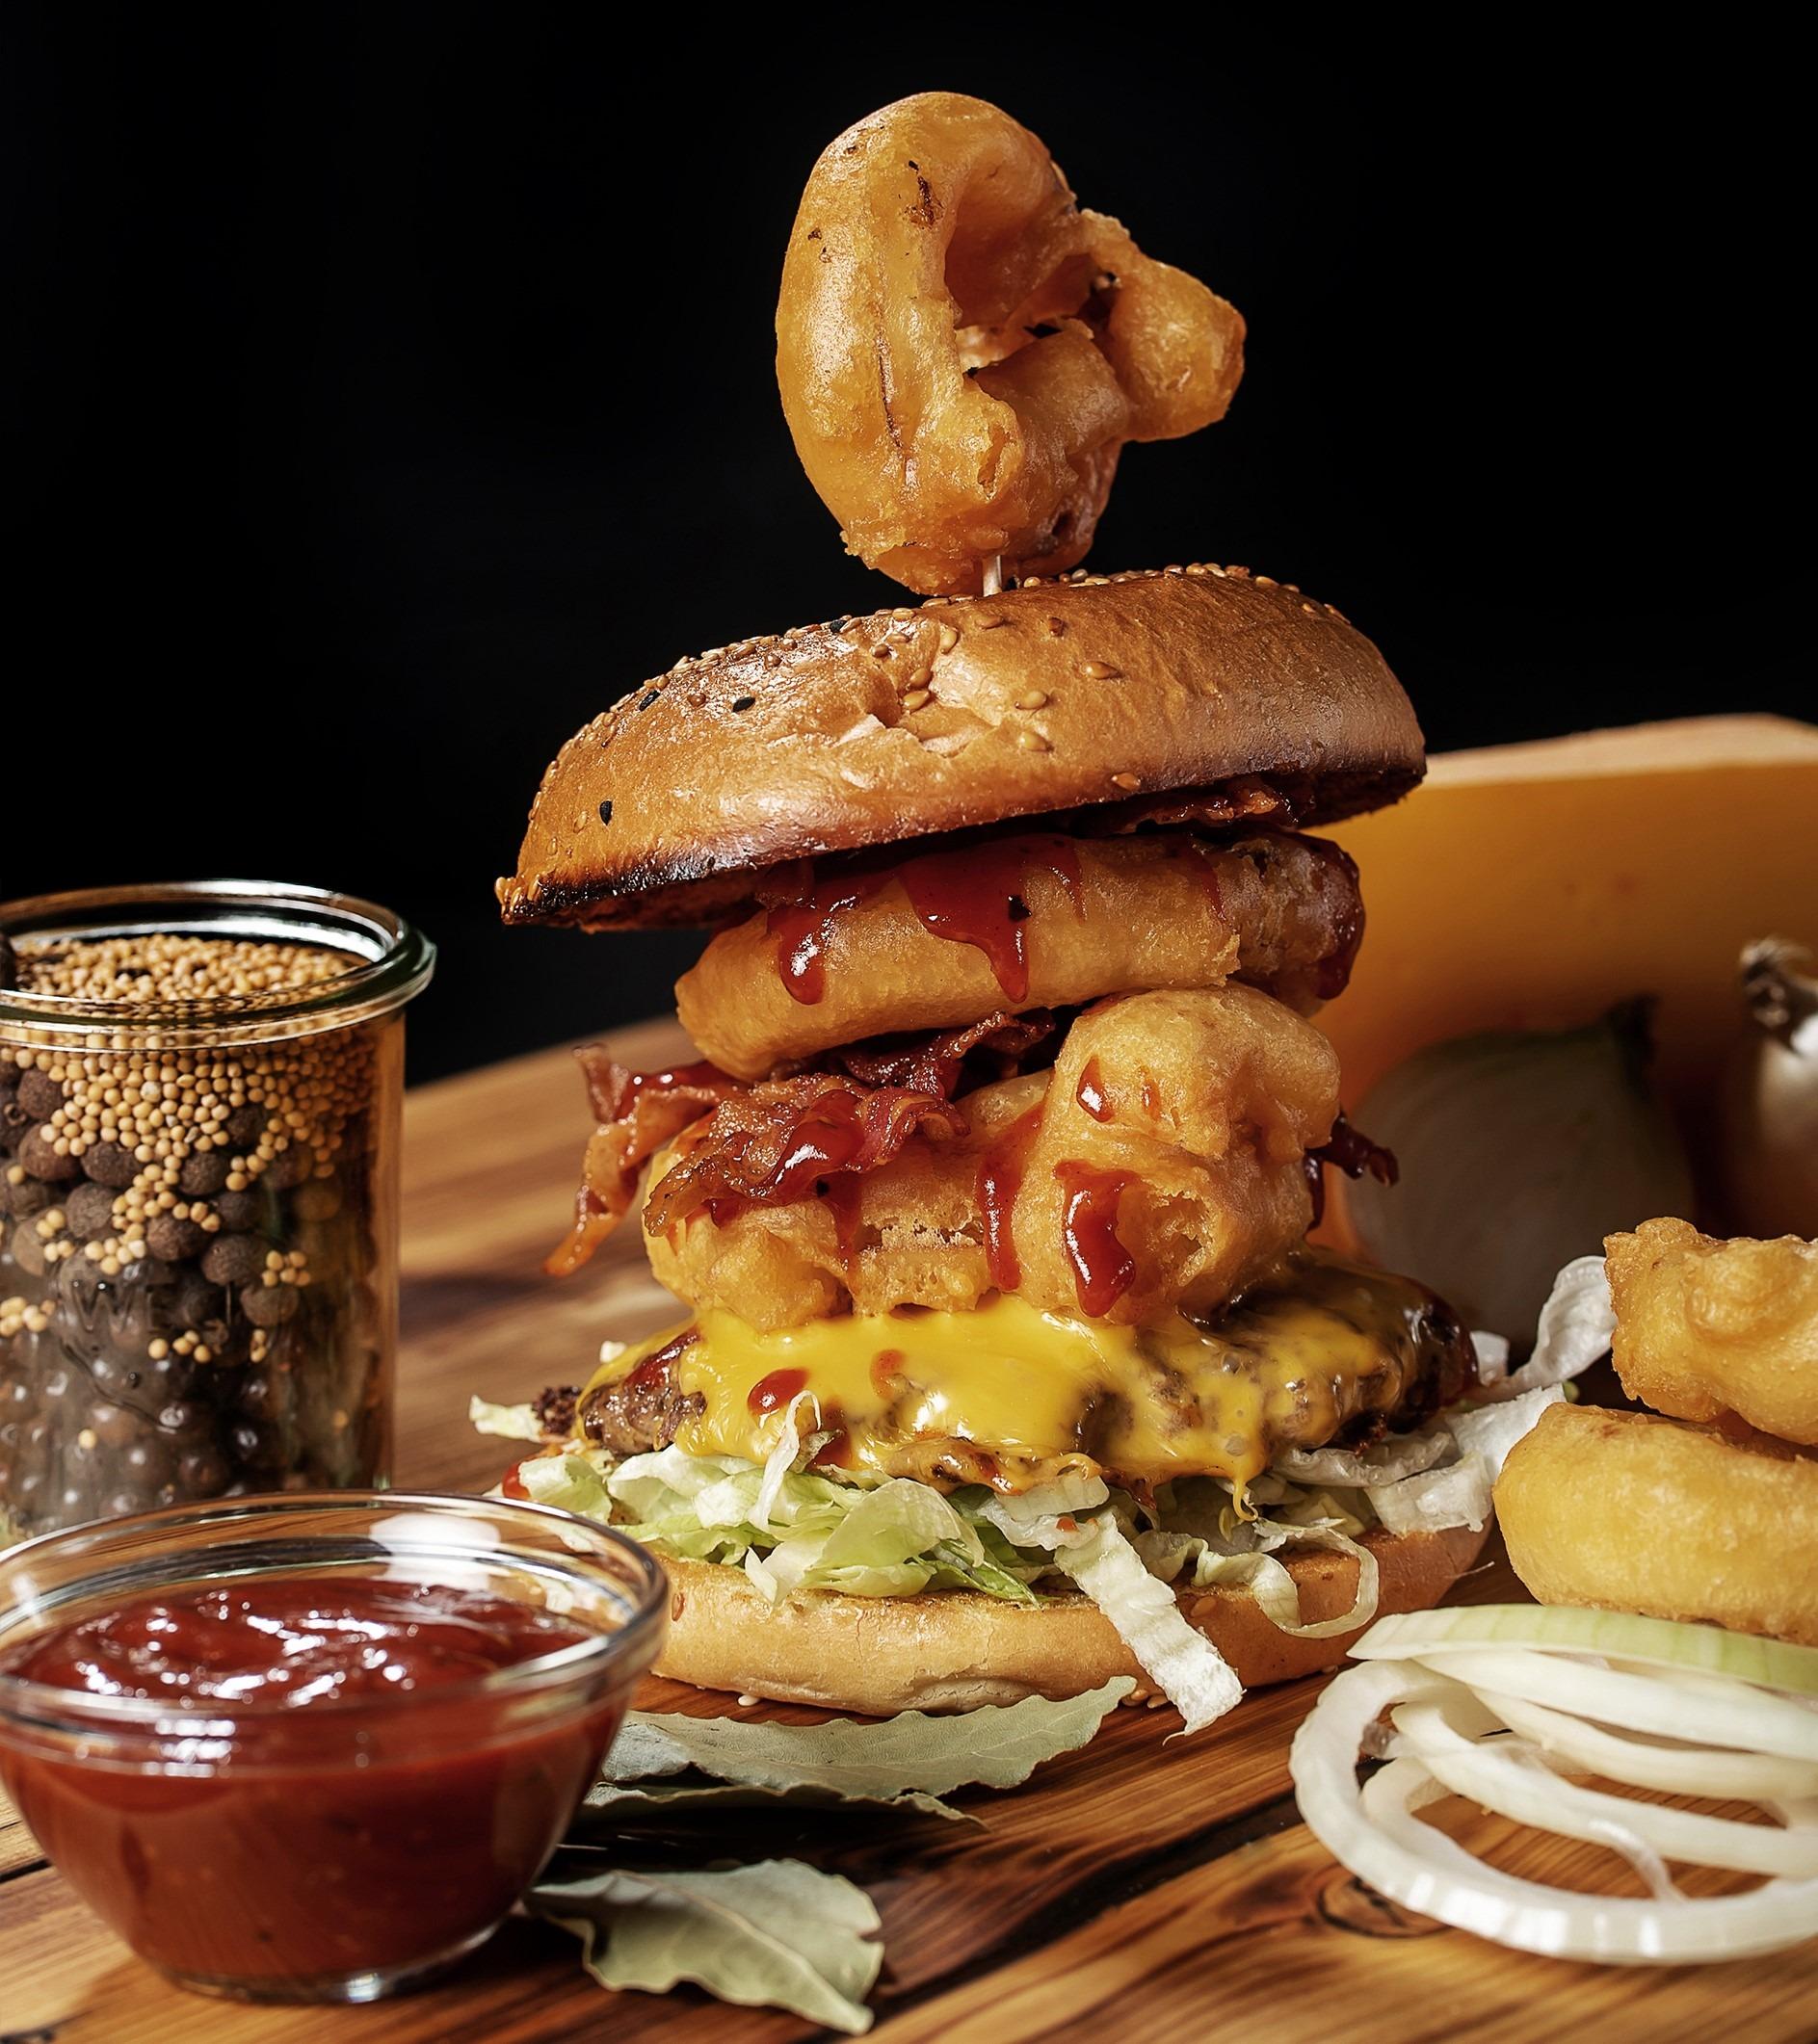 Burgerglück Western Onion Burger